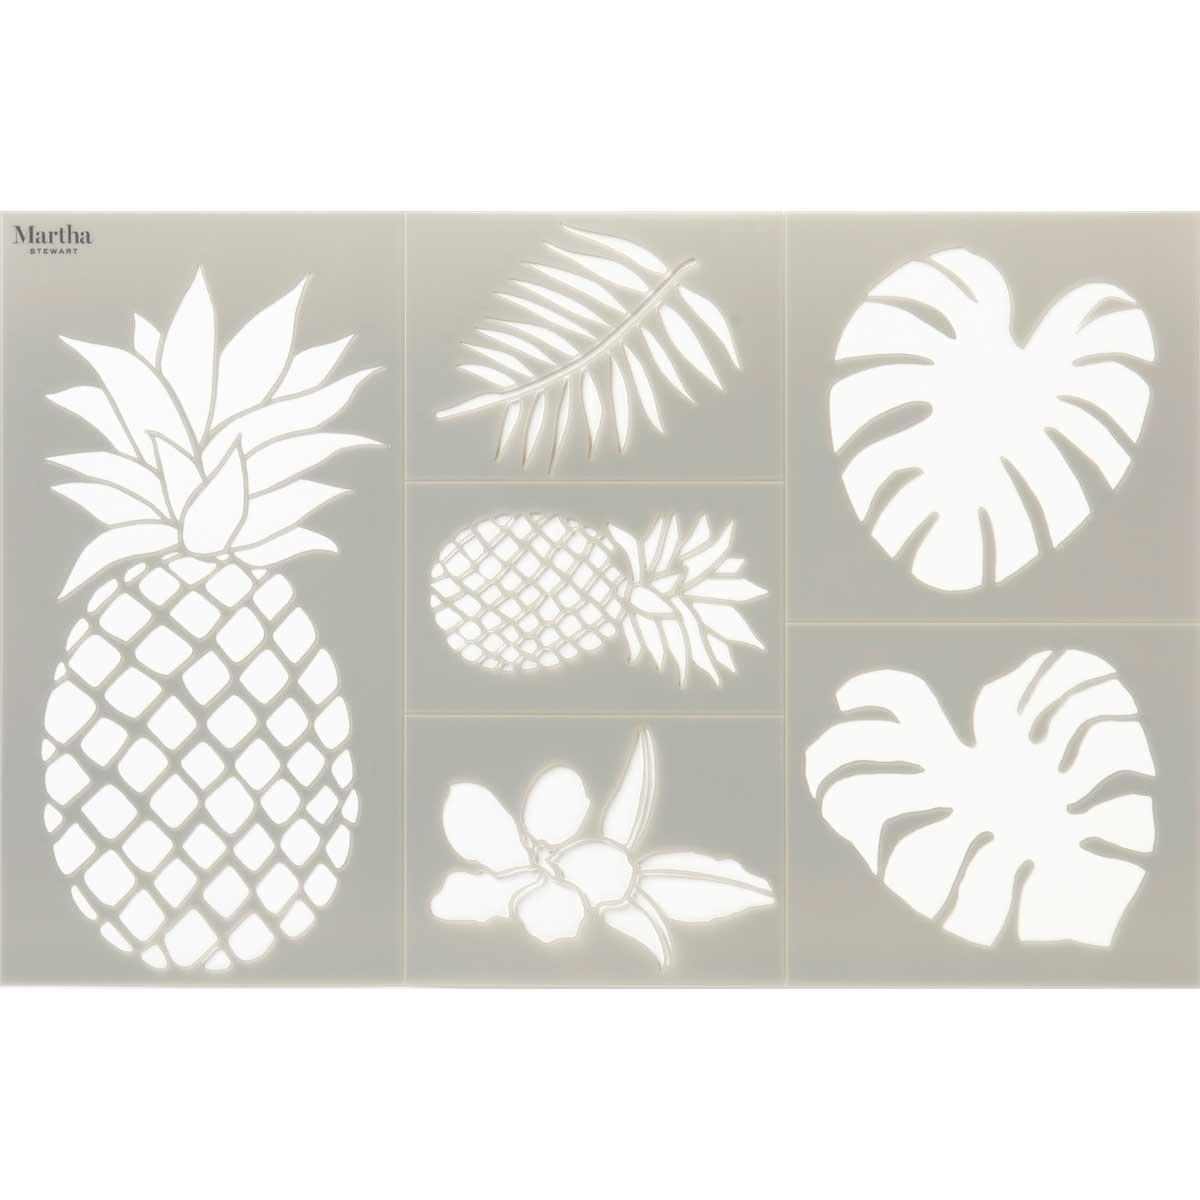 Martha Stewart® Adhesive Stencil - Pineapple